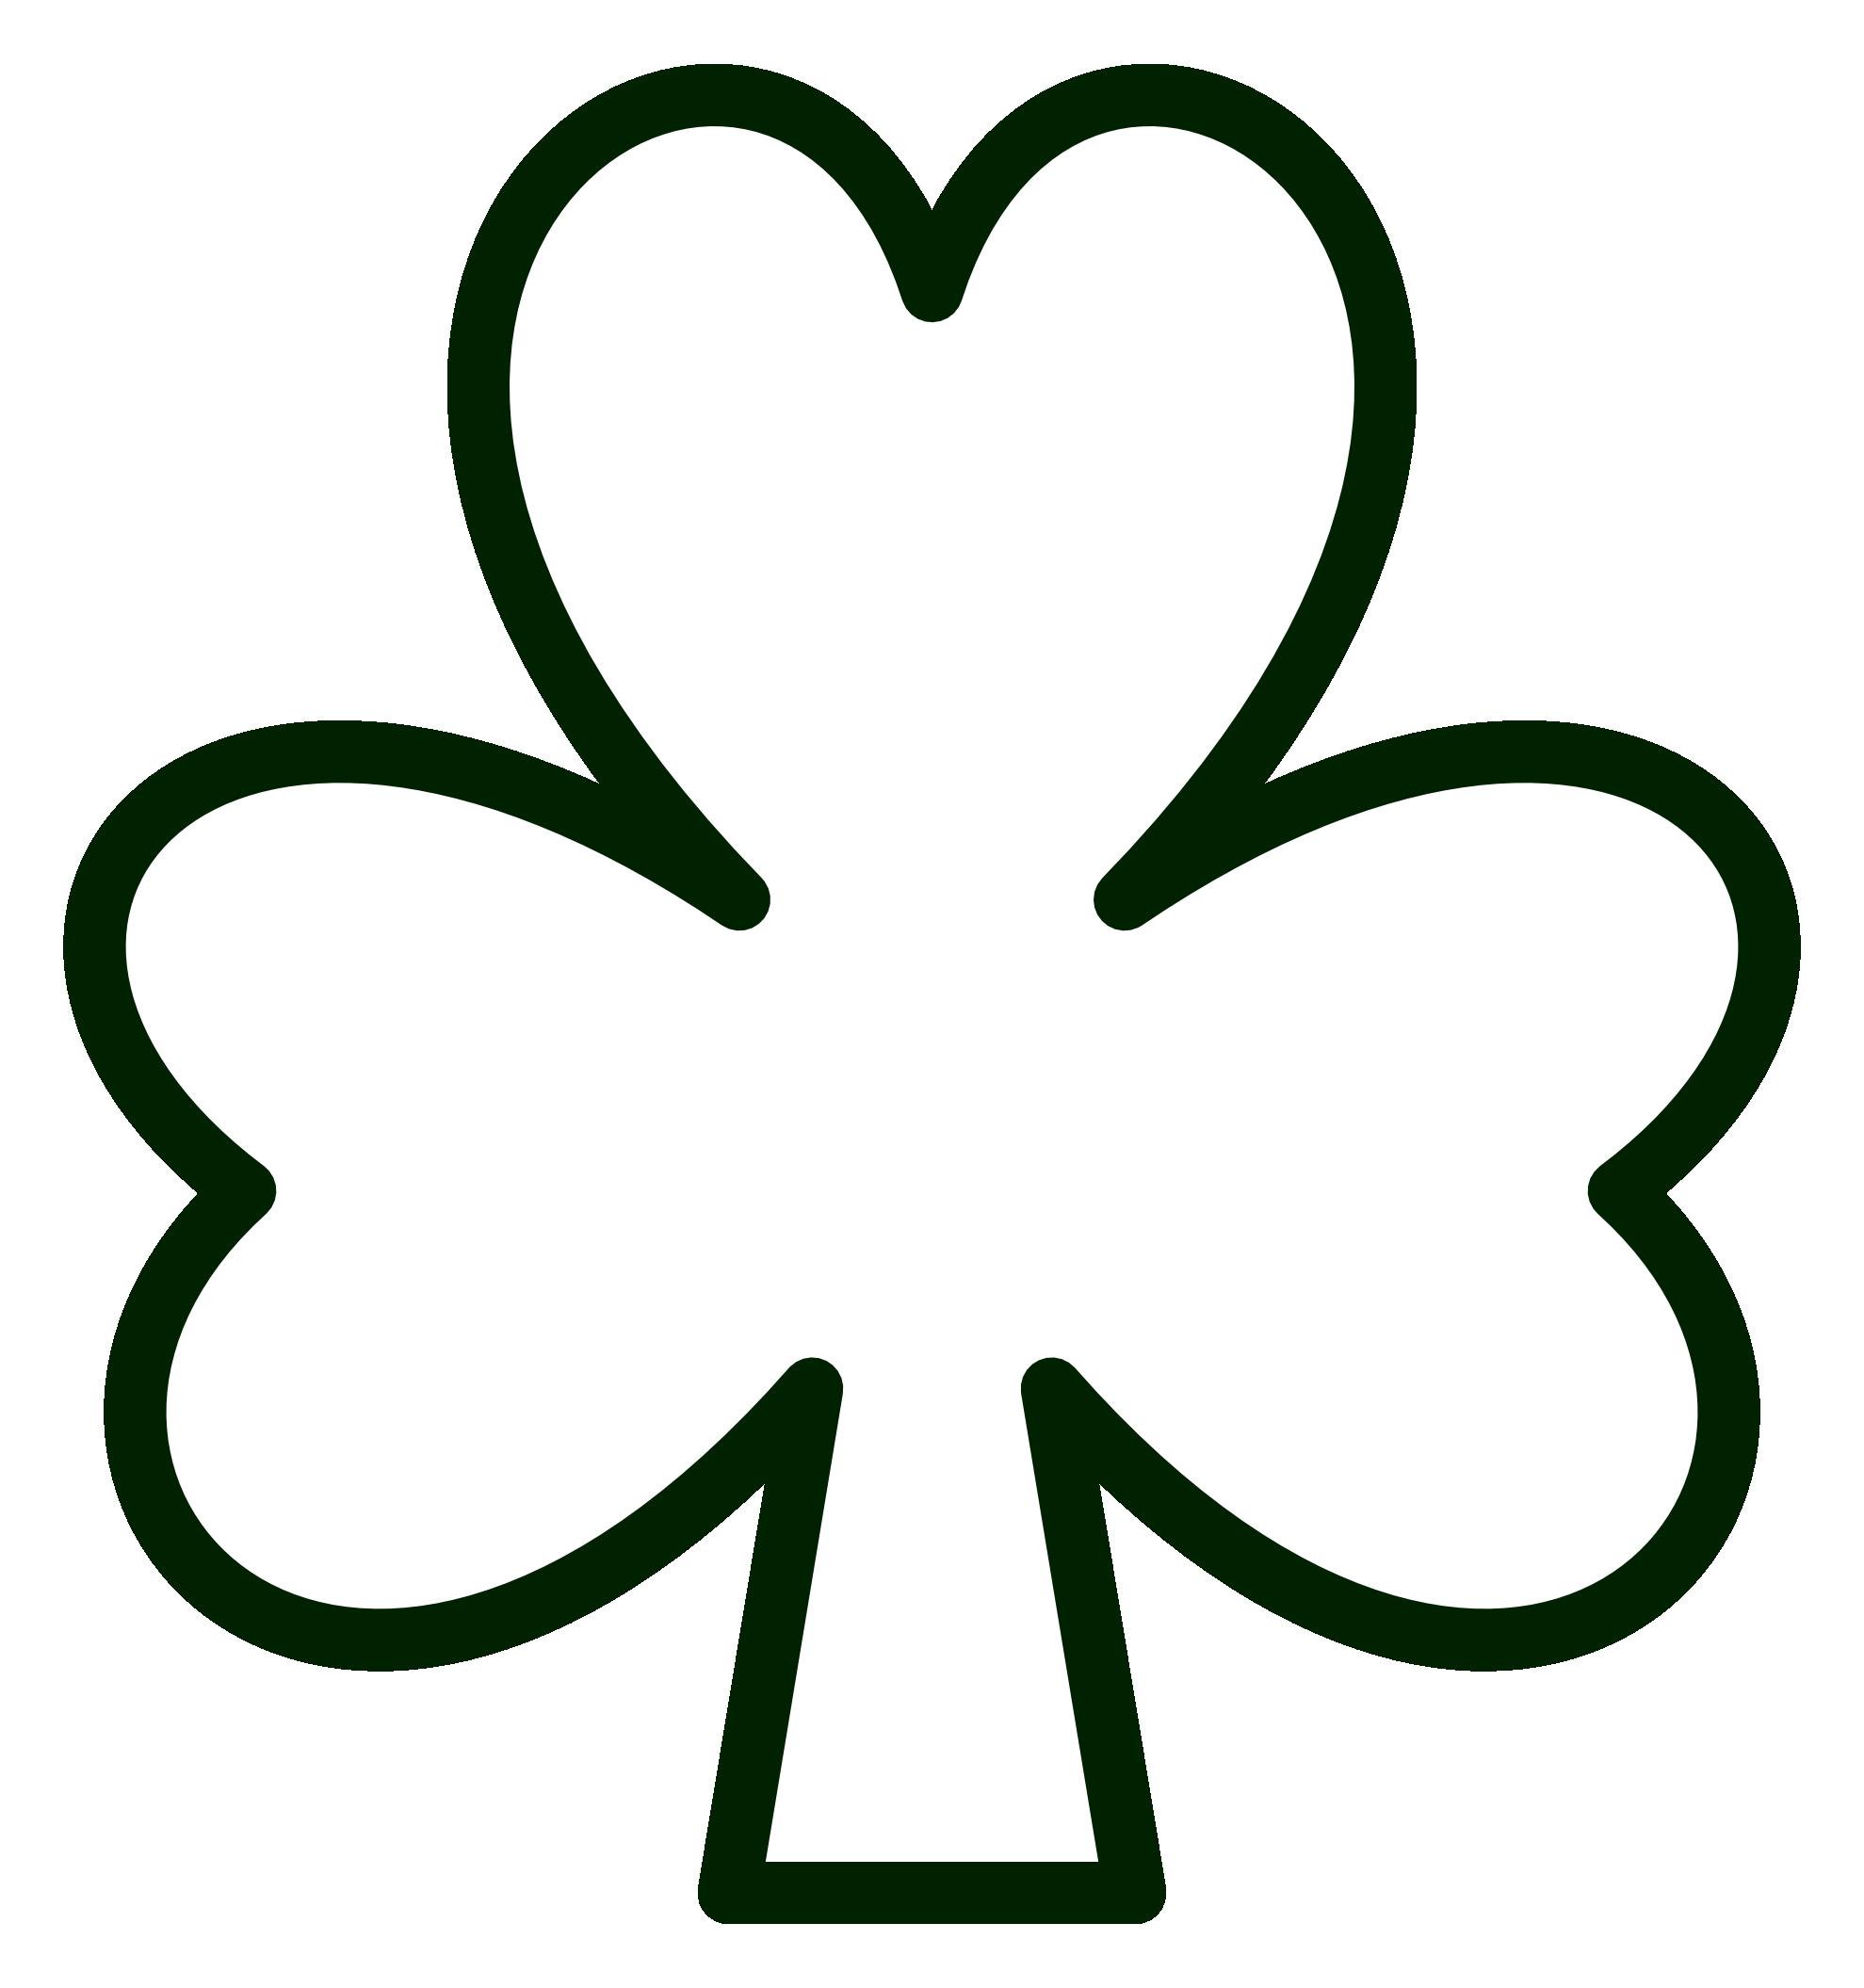 St Patrick S Day Shamrock Clip Art Shamrock template